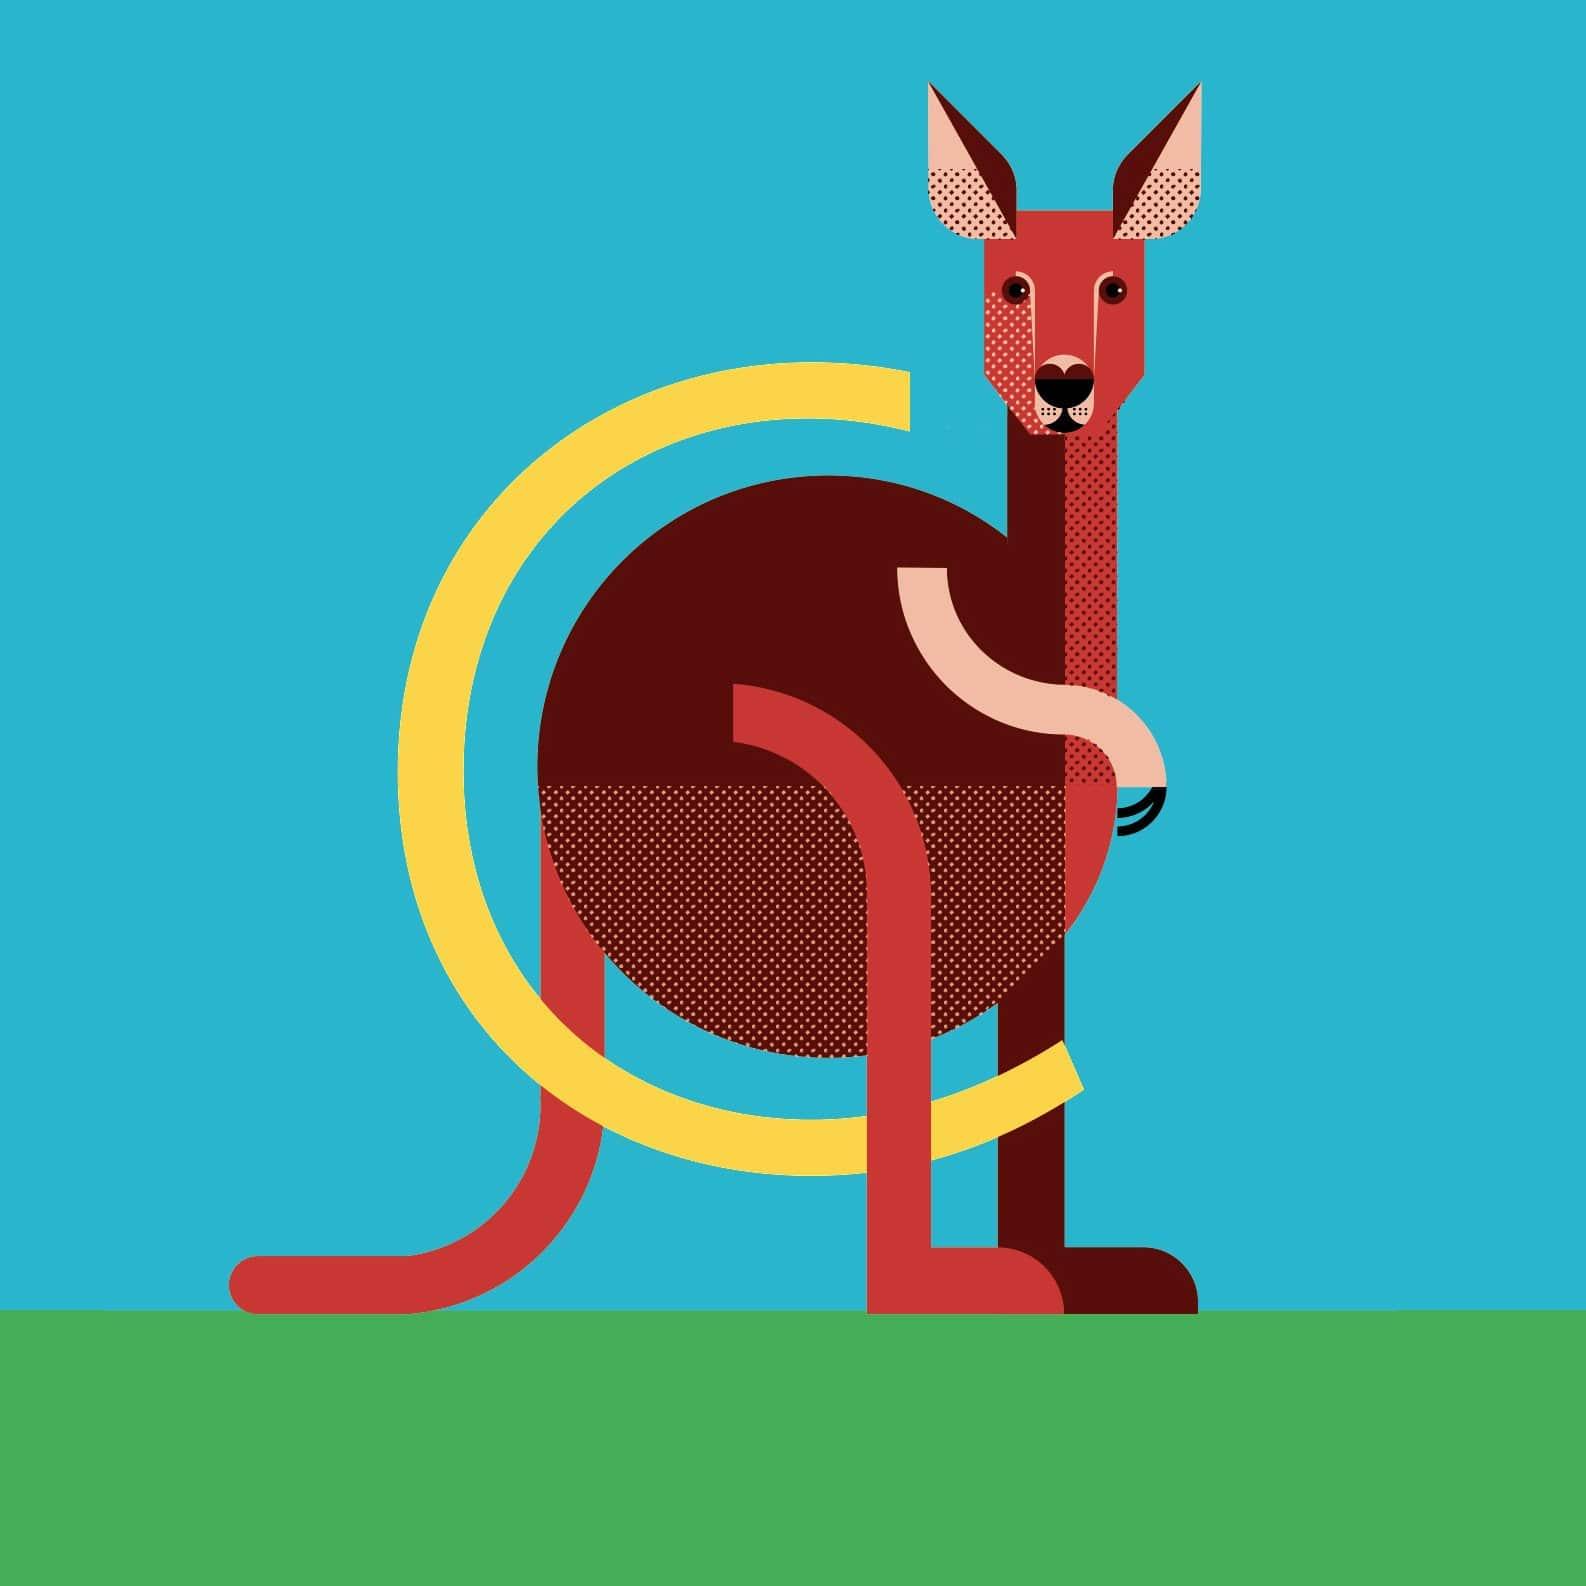 alice-iuri-poster-animal-kangaroo-illustration